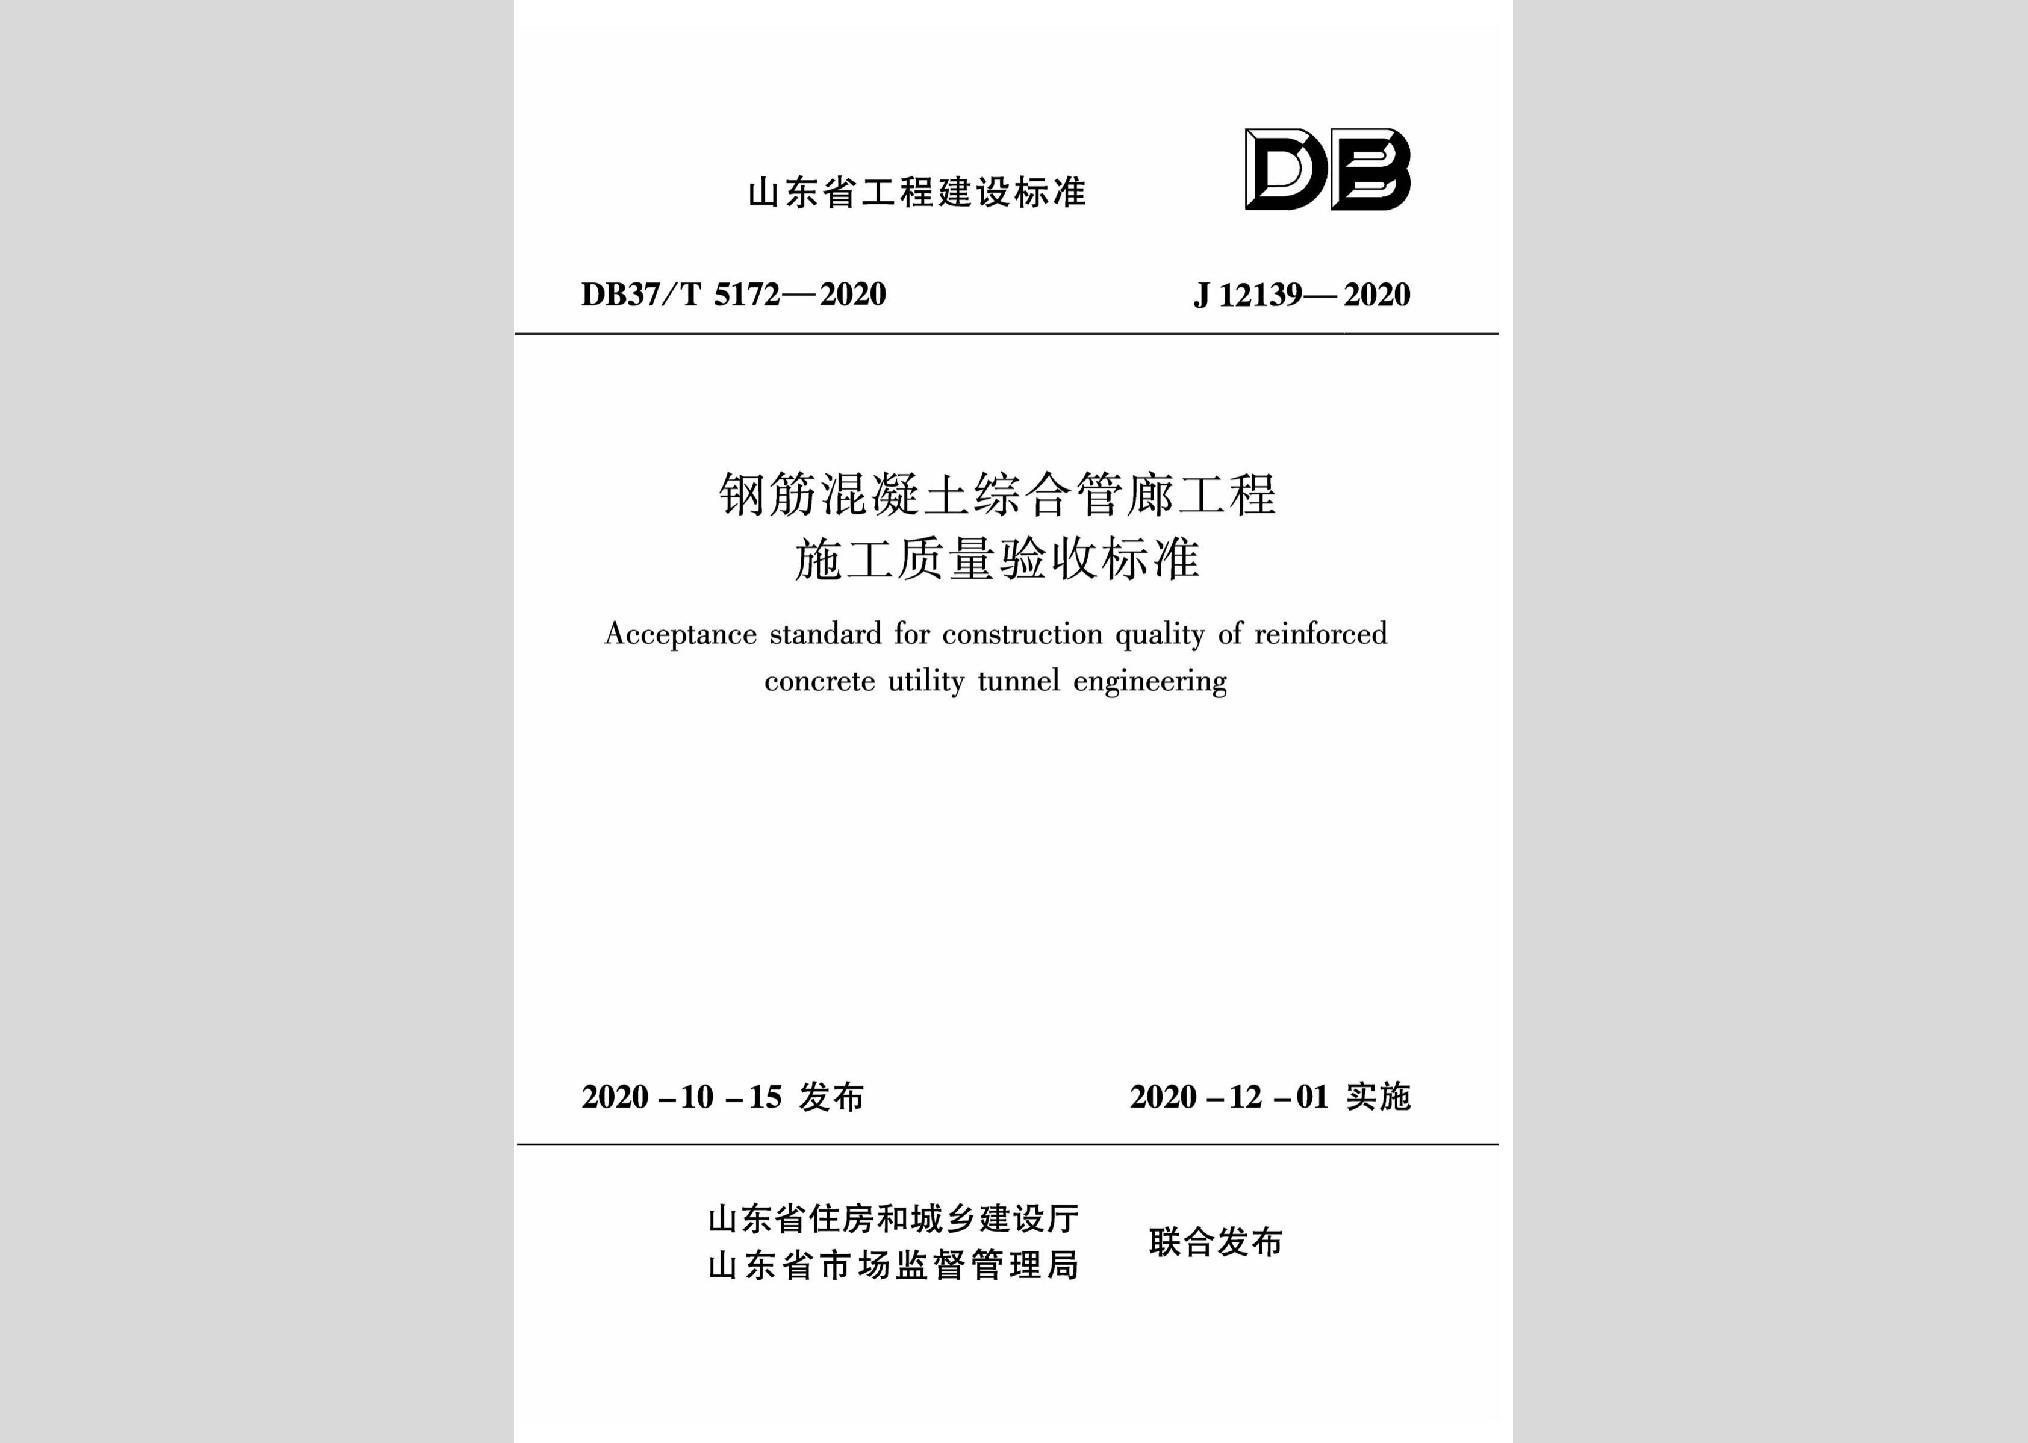 DB37/T5172-2020:钢筋混凝土综合管廊工程施工质量验收标准